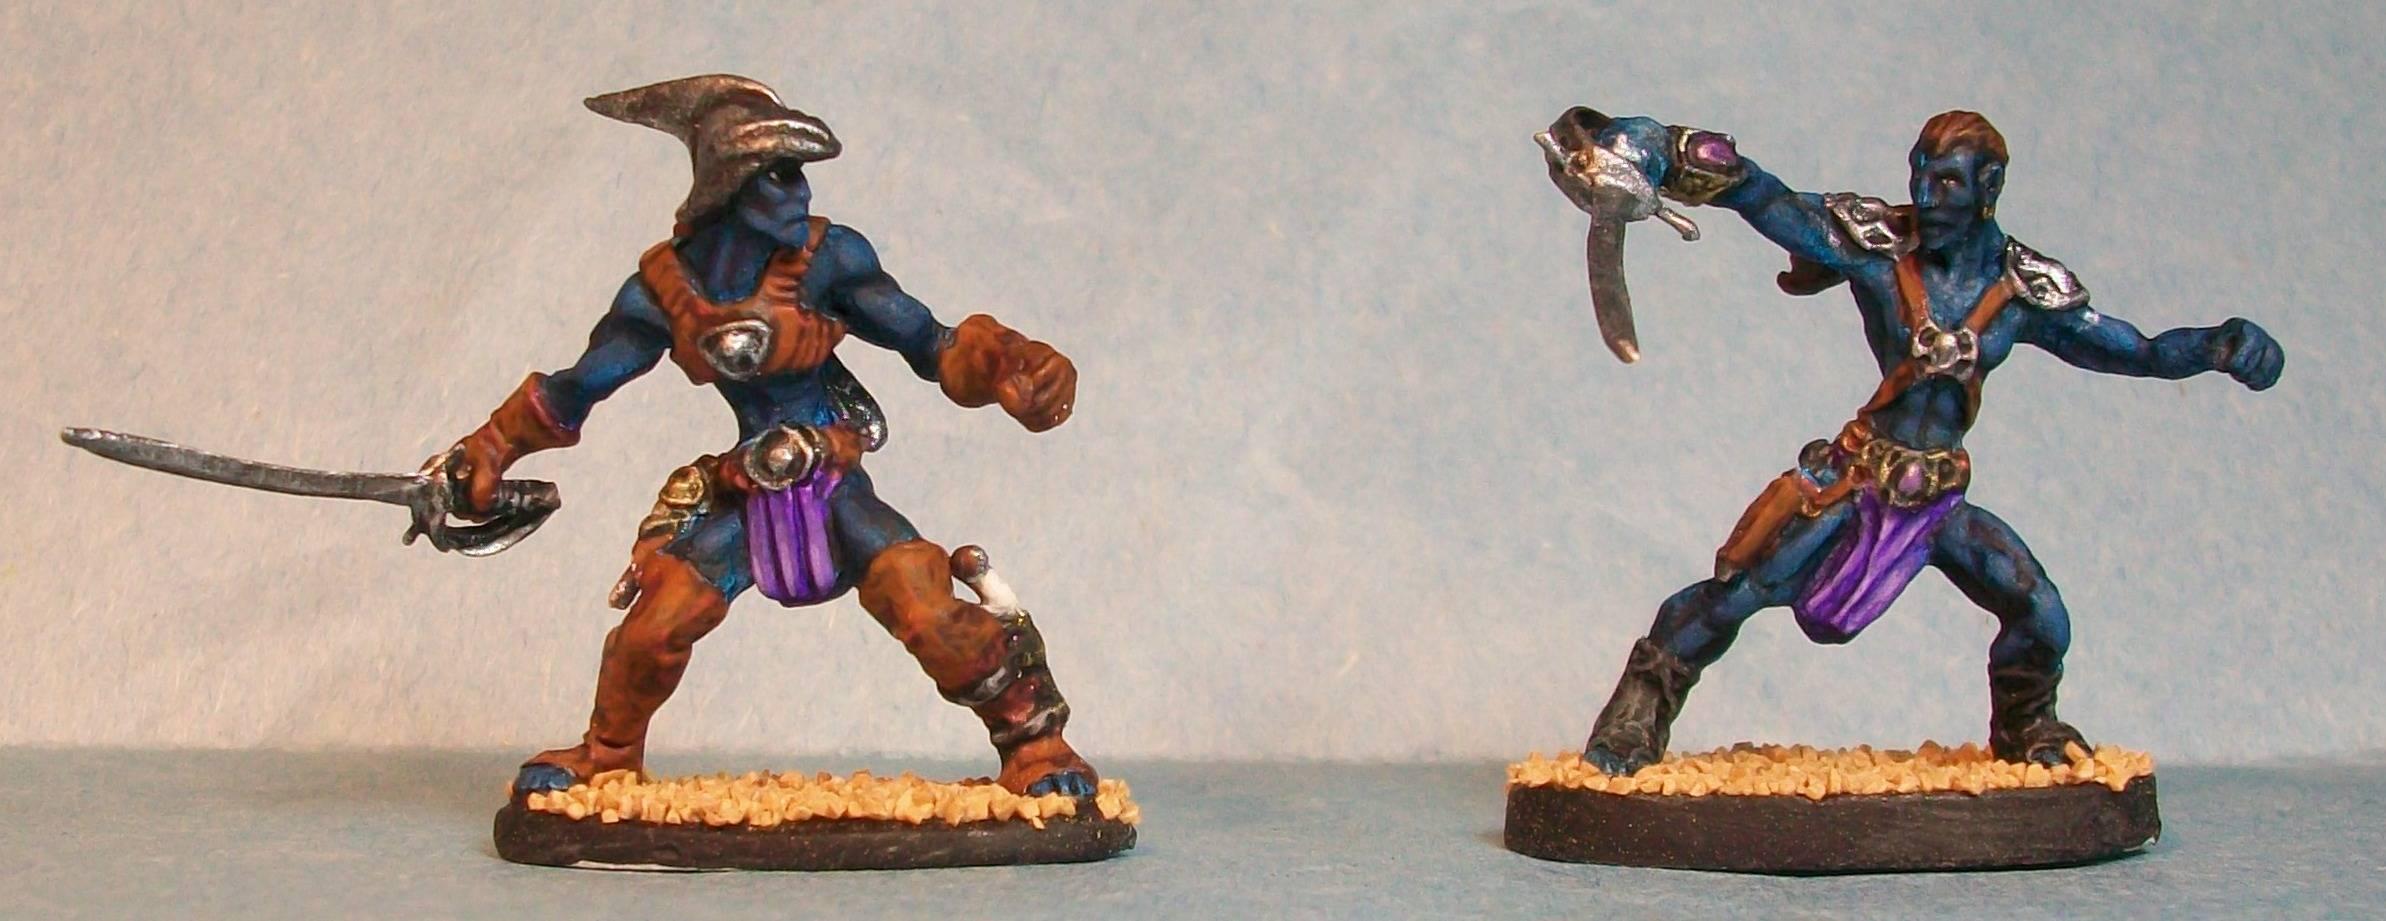 Male Black Pirate Warriors